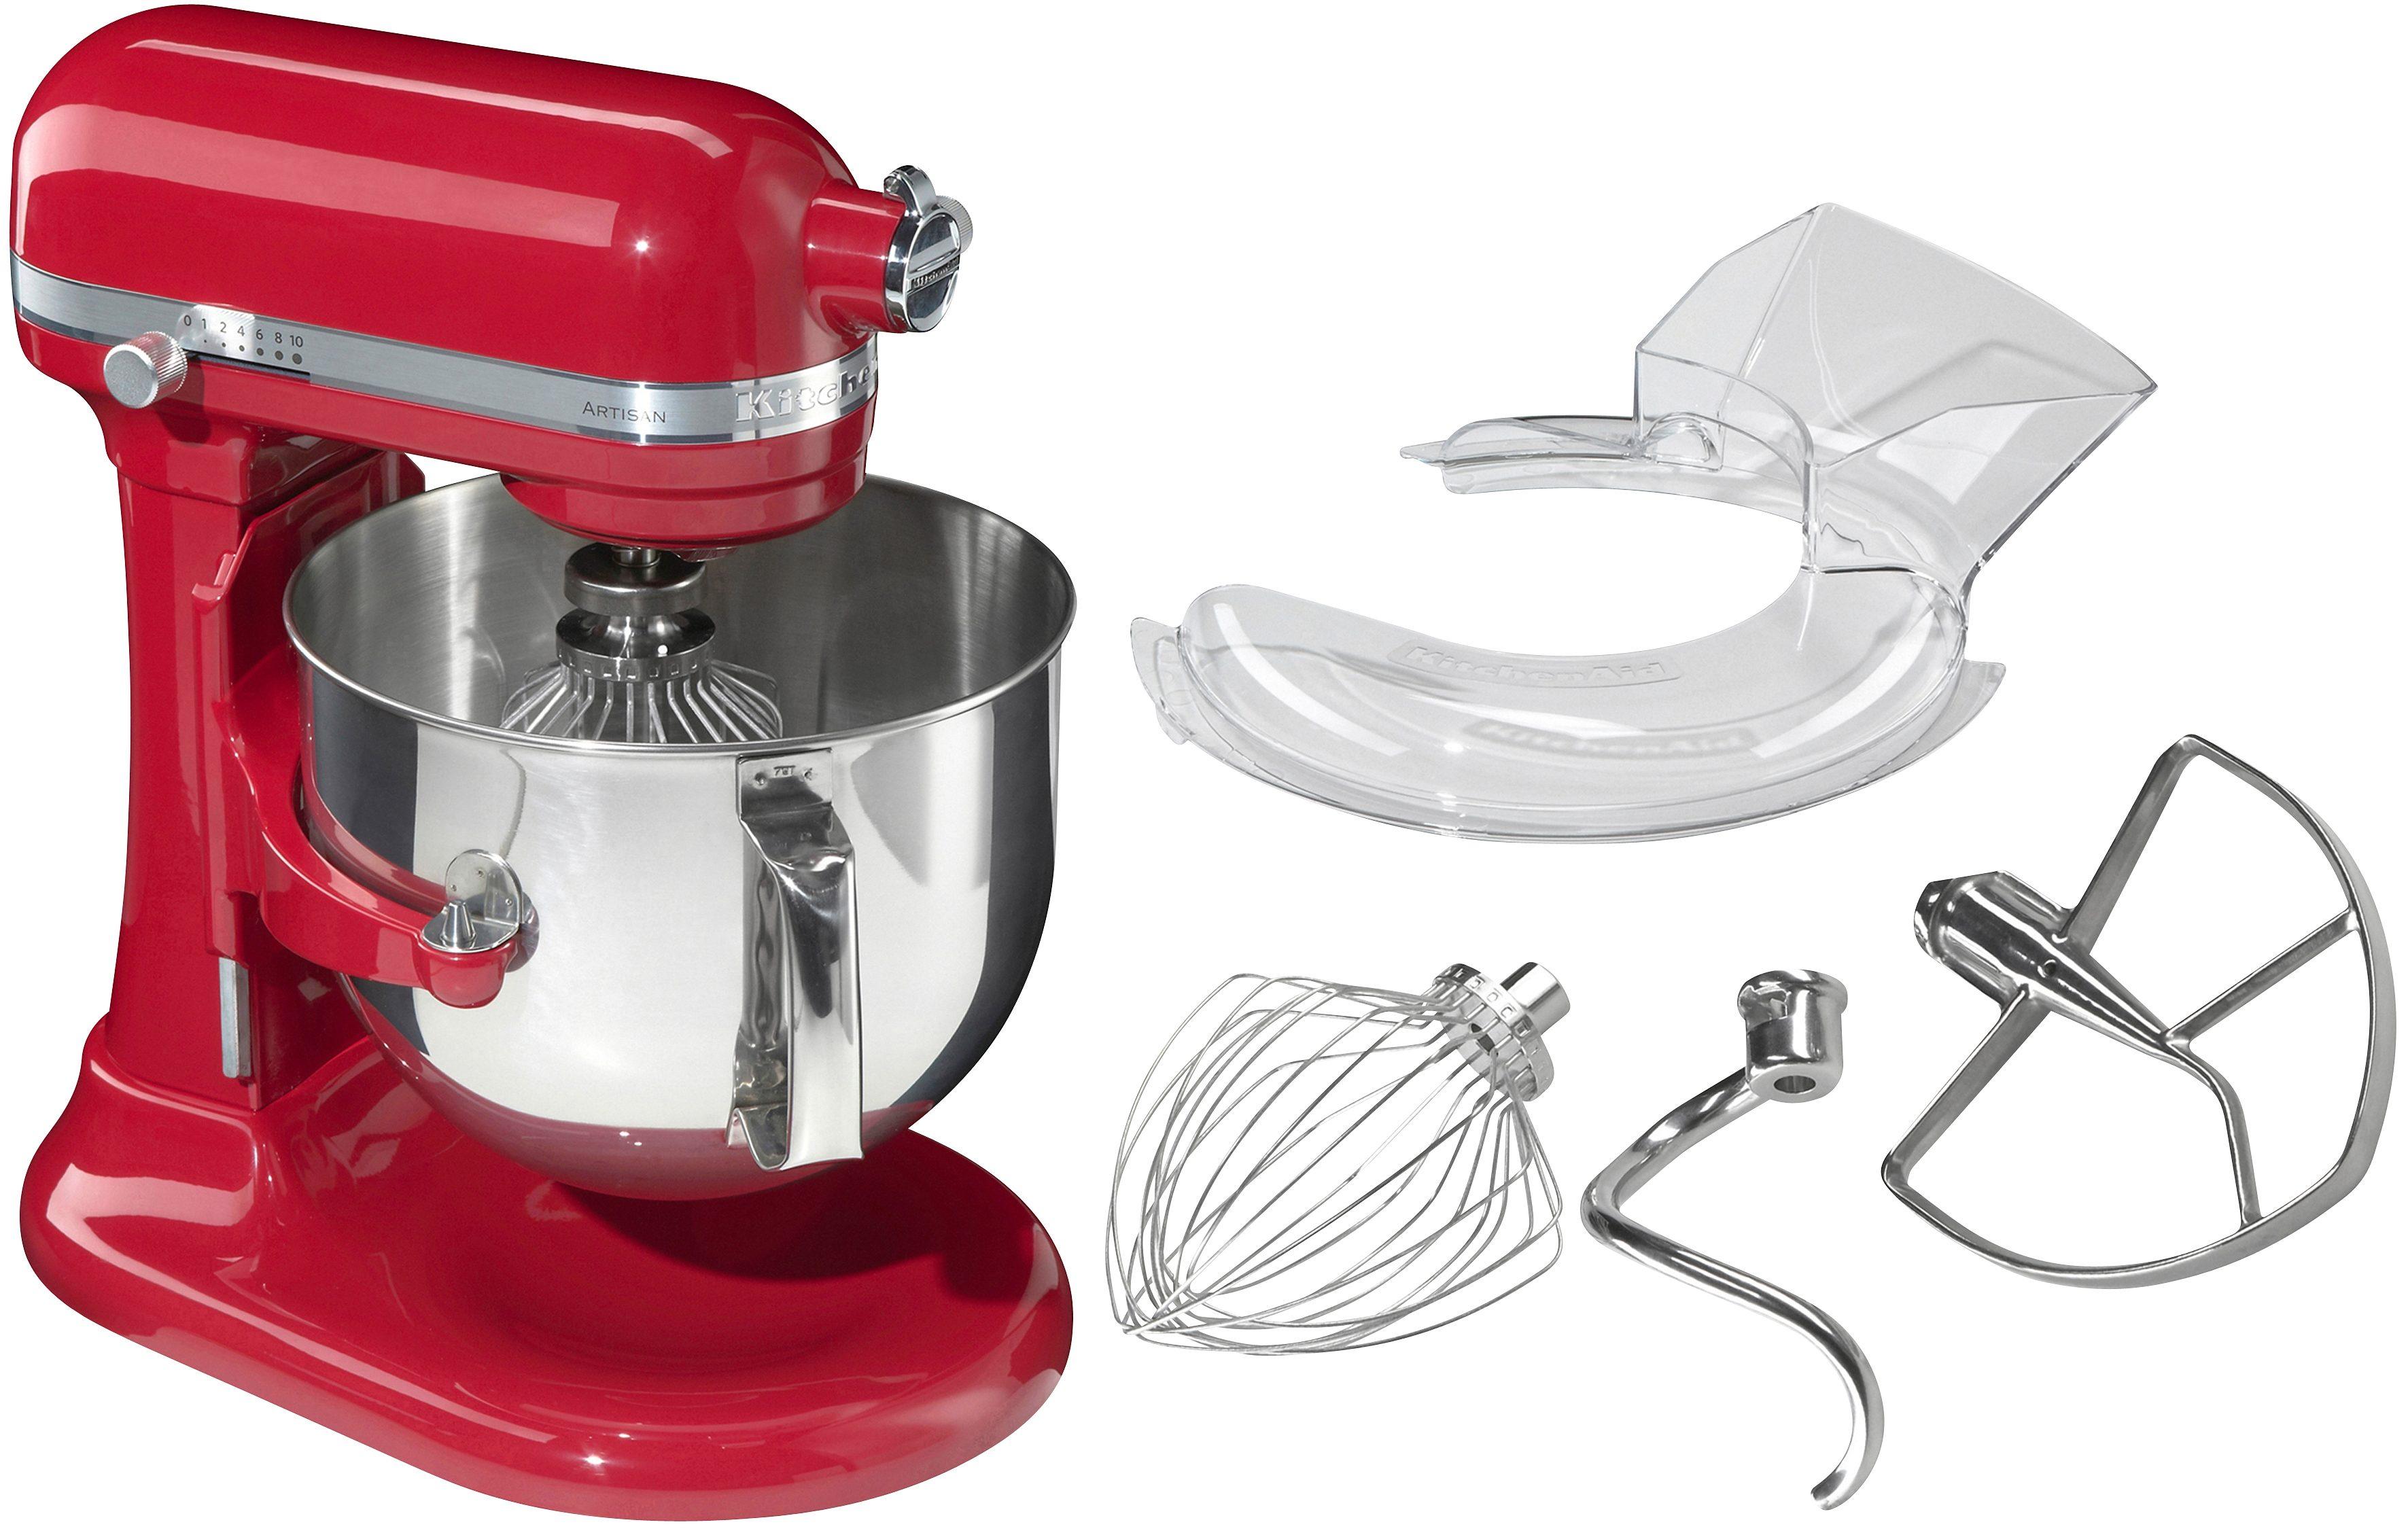 KitchenAid® Artisan Küchenmaschine 5KSM7580XEER